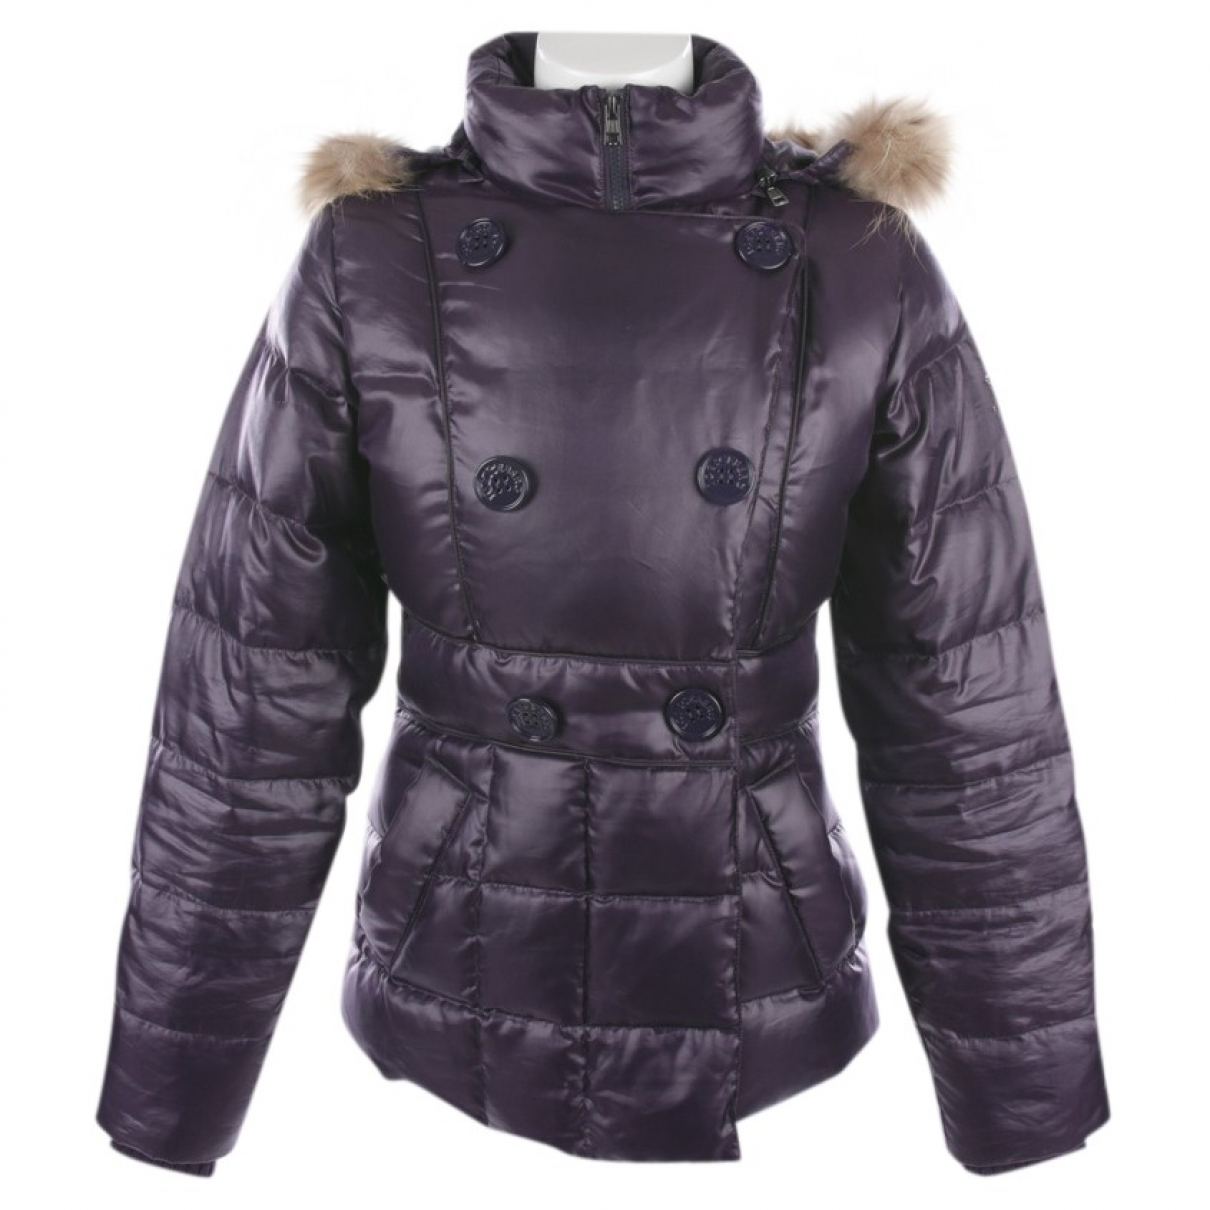 Iceberg \N Purple jacket for Women S International